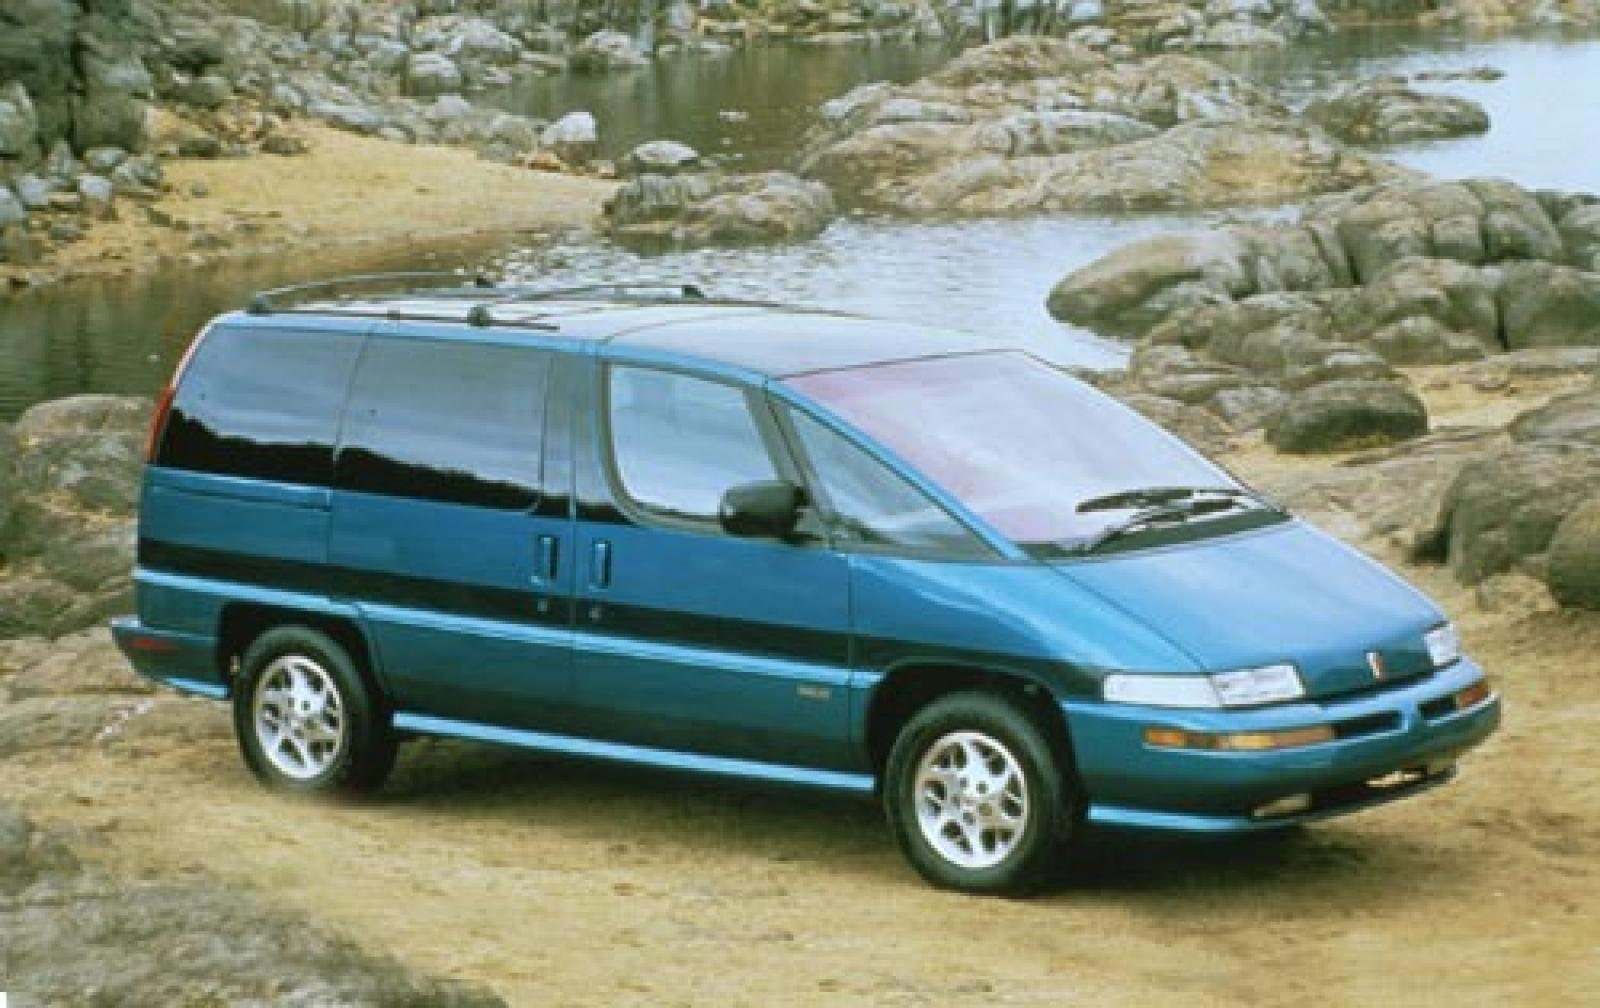 Oldsmobile Silhouette I 1989 - 1996 Minivan #4